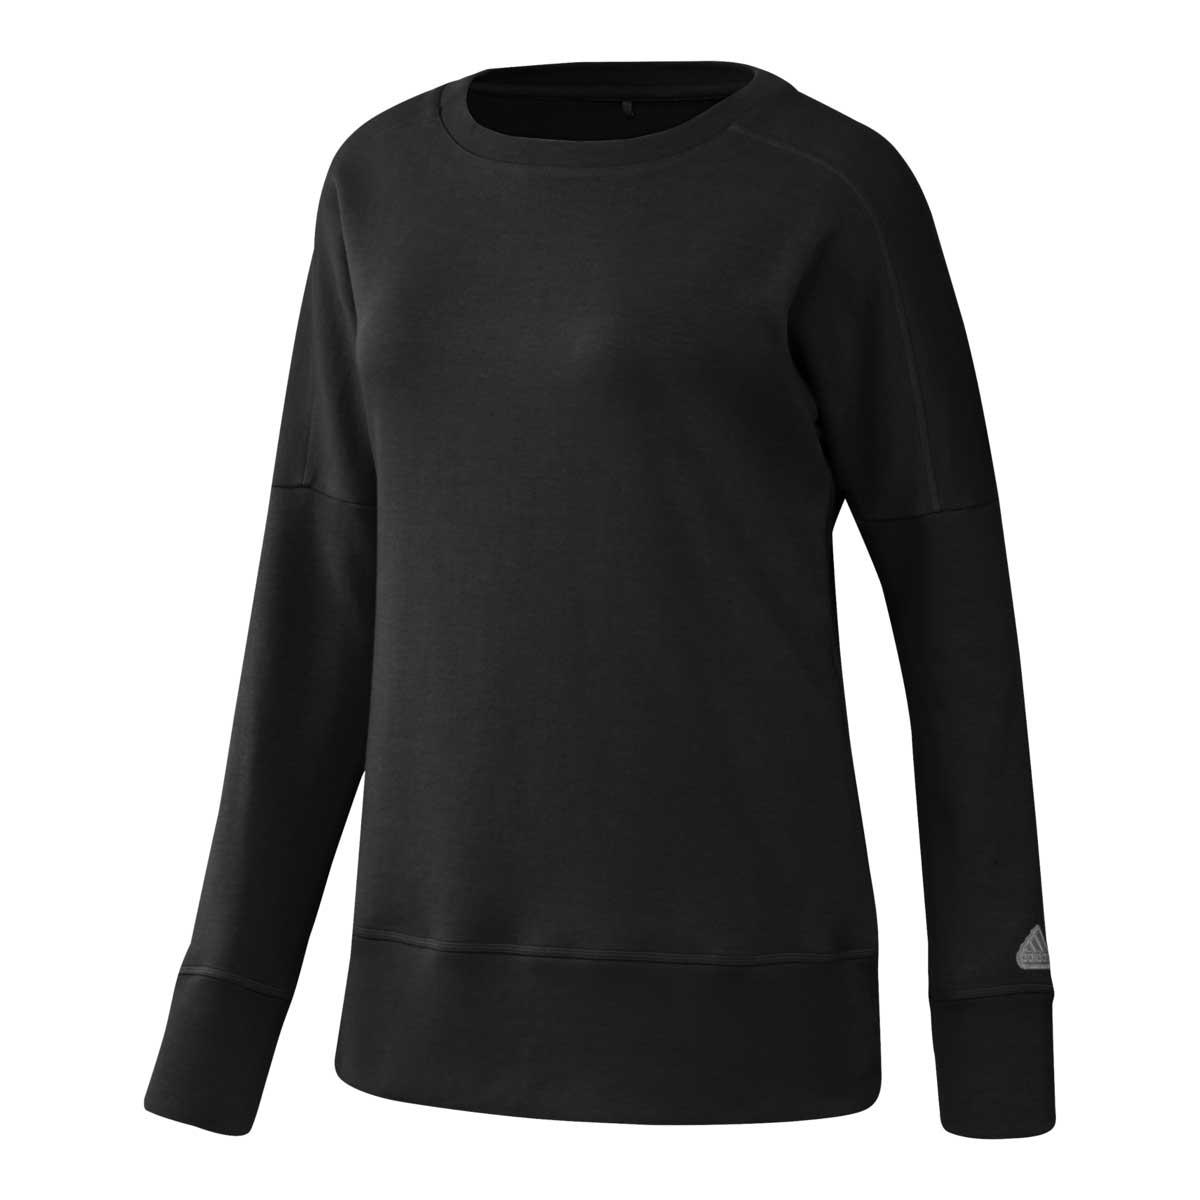 Adidas Women's Go-To Black Sweatshirt